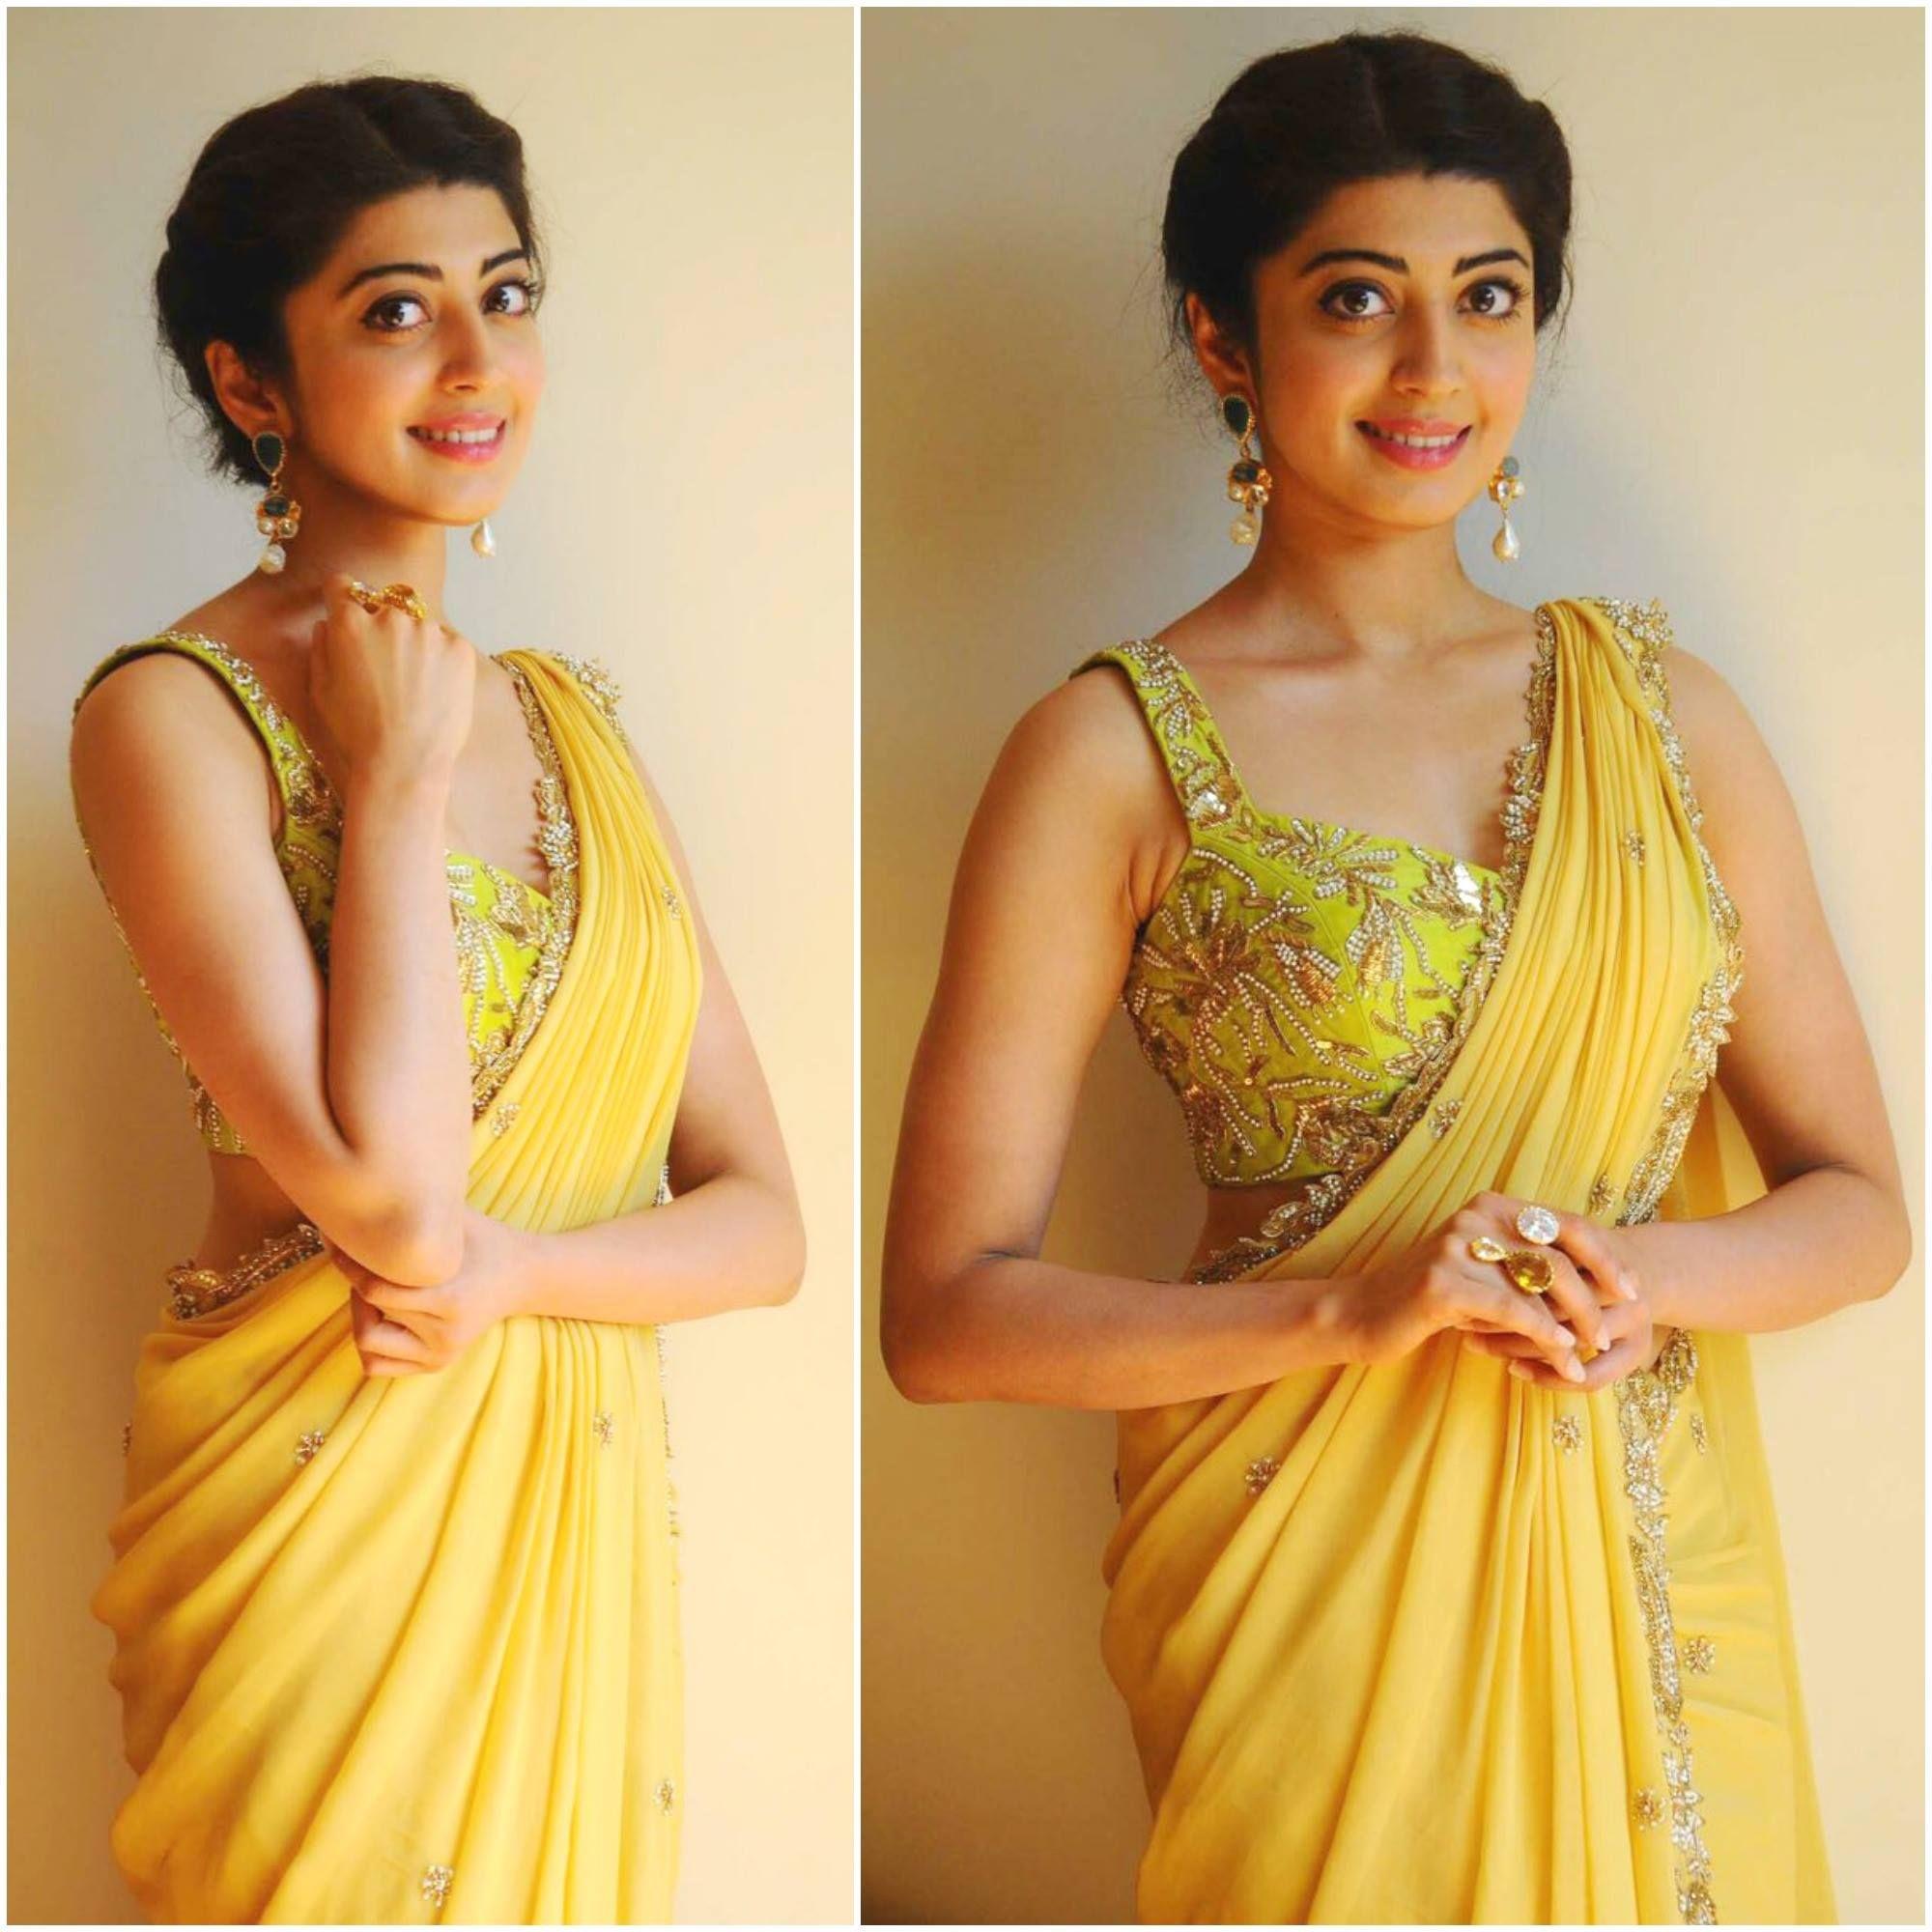 Geetika Chadha.